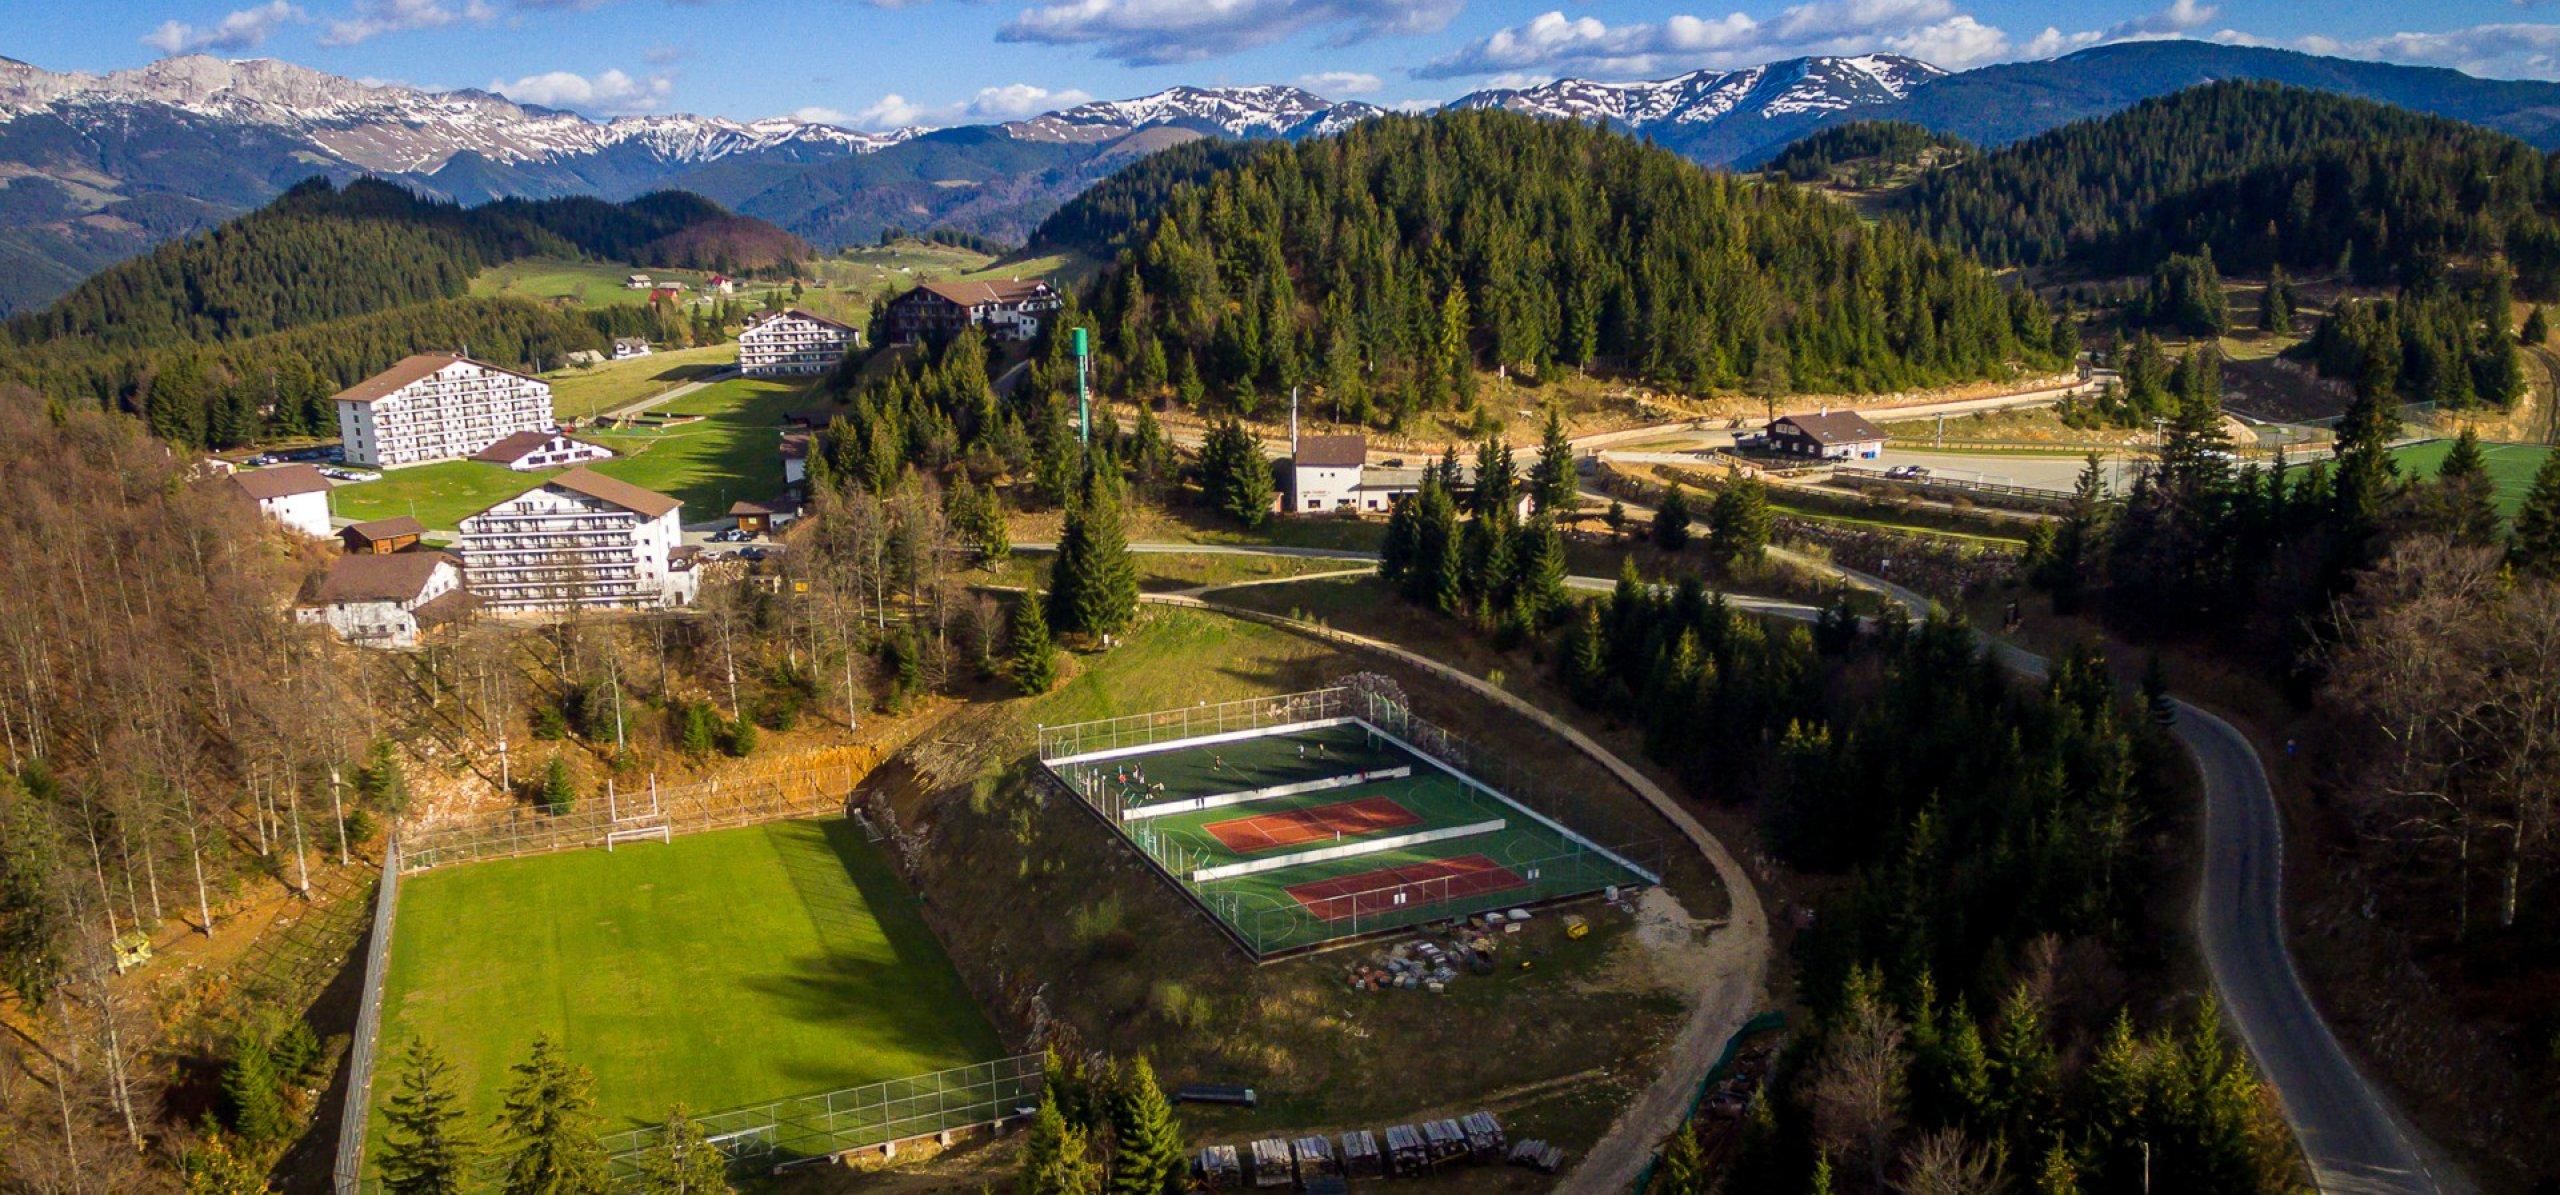 Terenuri de sport la 1300 metrii altitudine